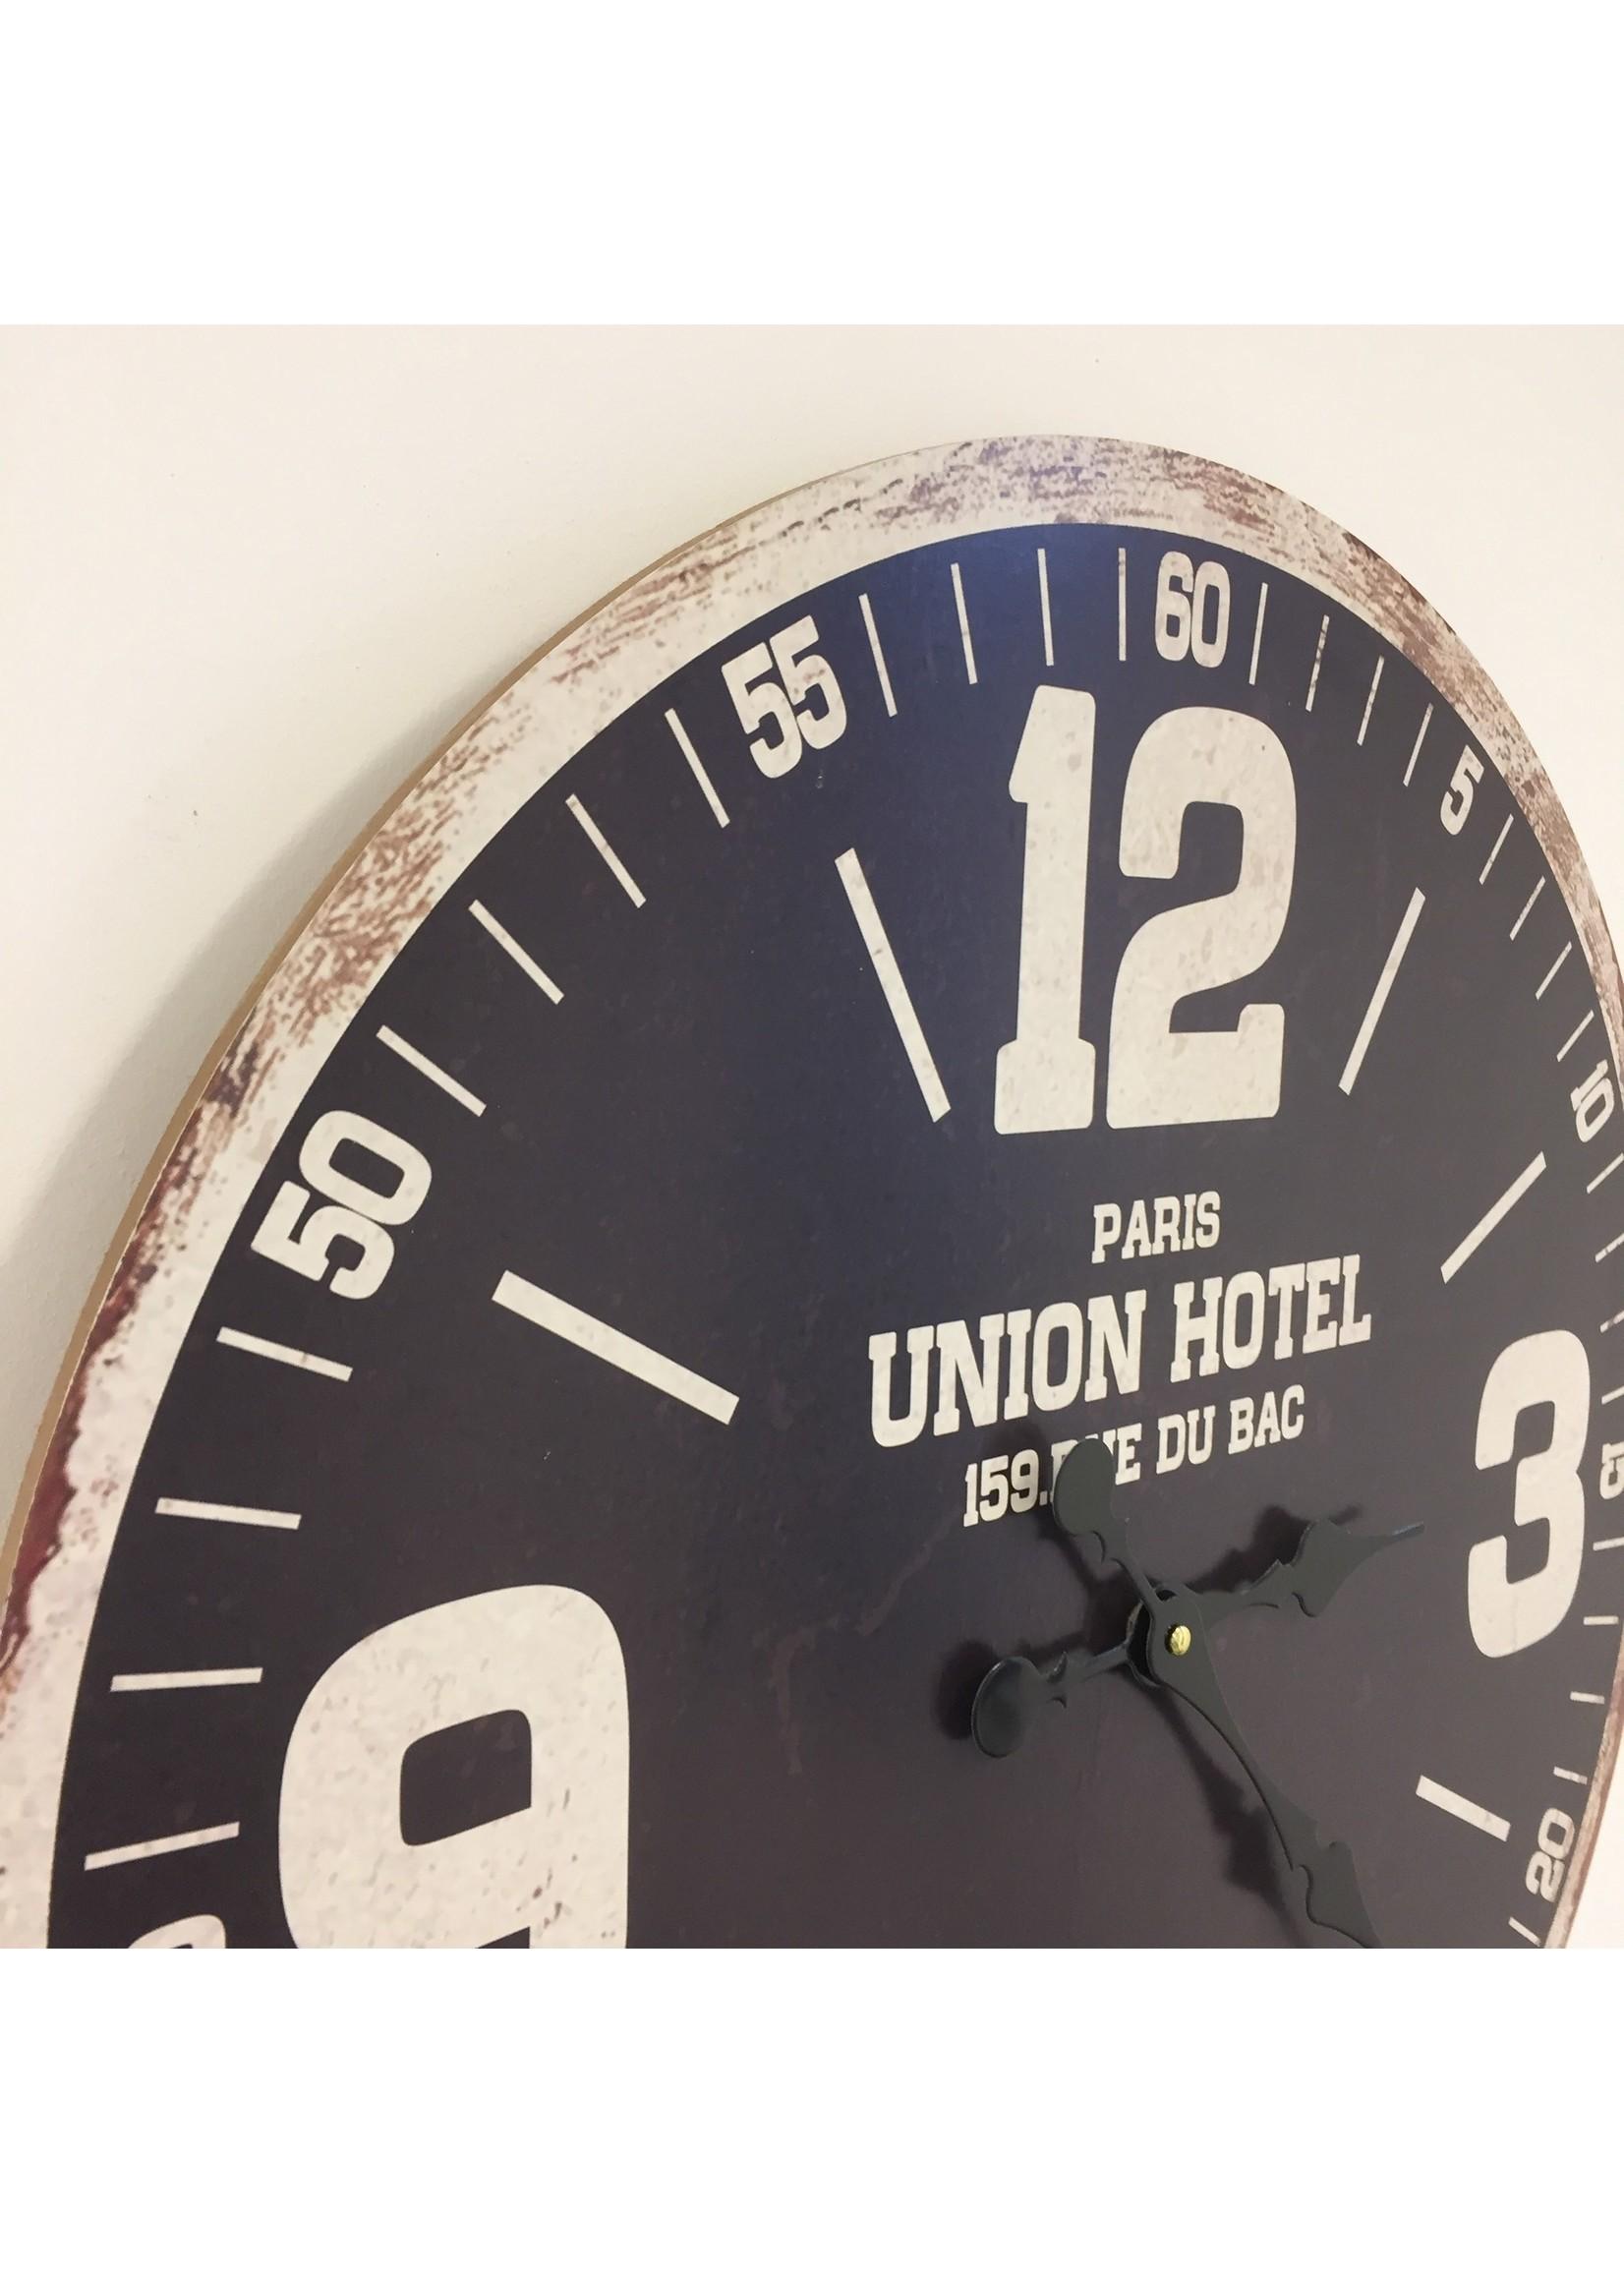 Wandklok UNION HOTEL ZWART RETRO INDUSTRIEEL DESIGN